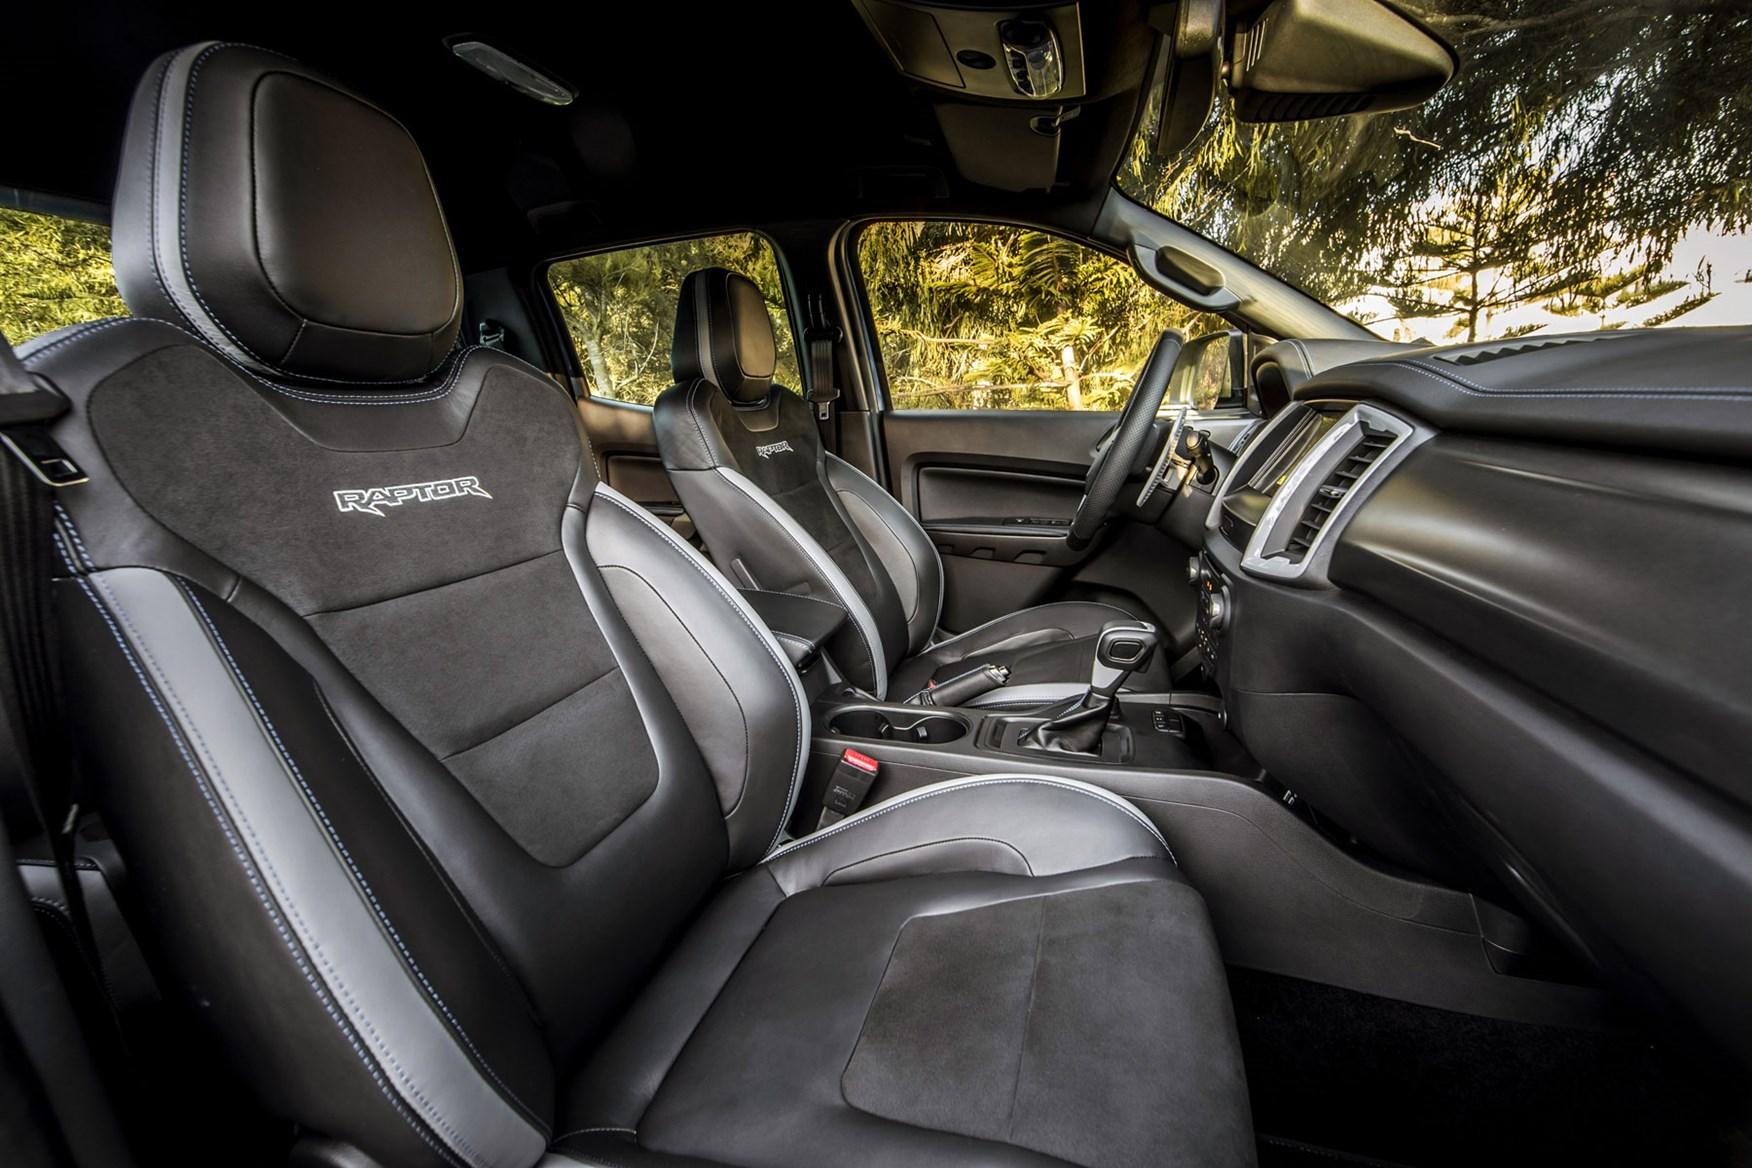 Ford Raptor Interior >> Ford Ranger Raptor Review High Performance Off Road Pickup